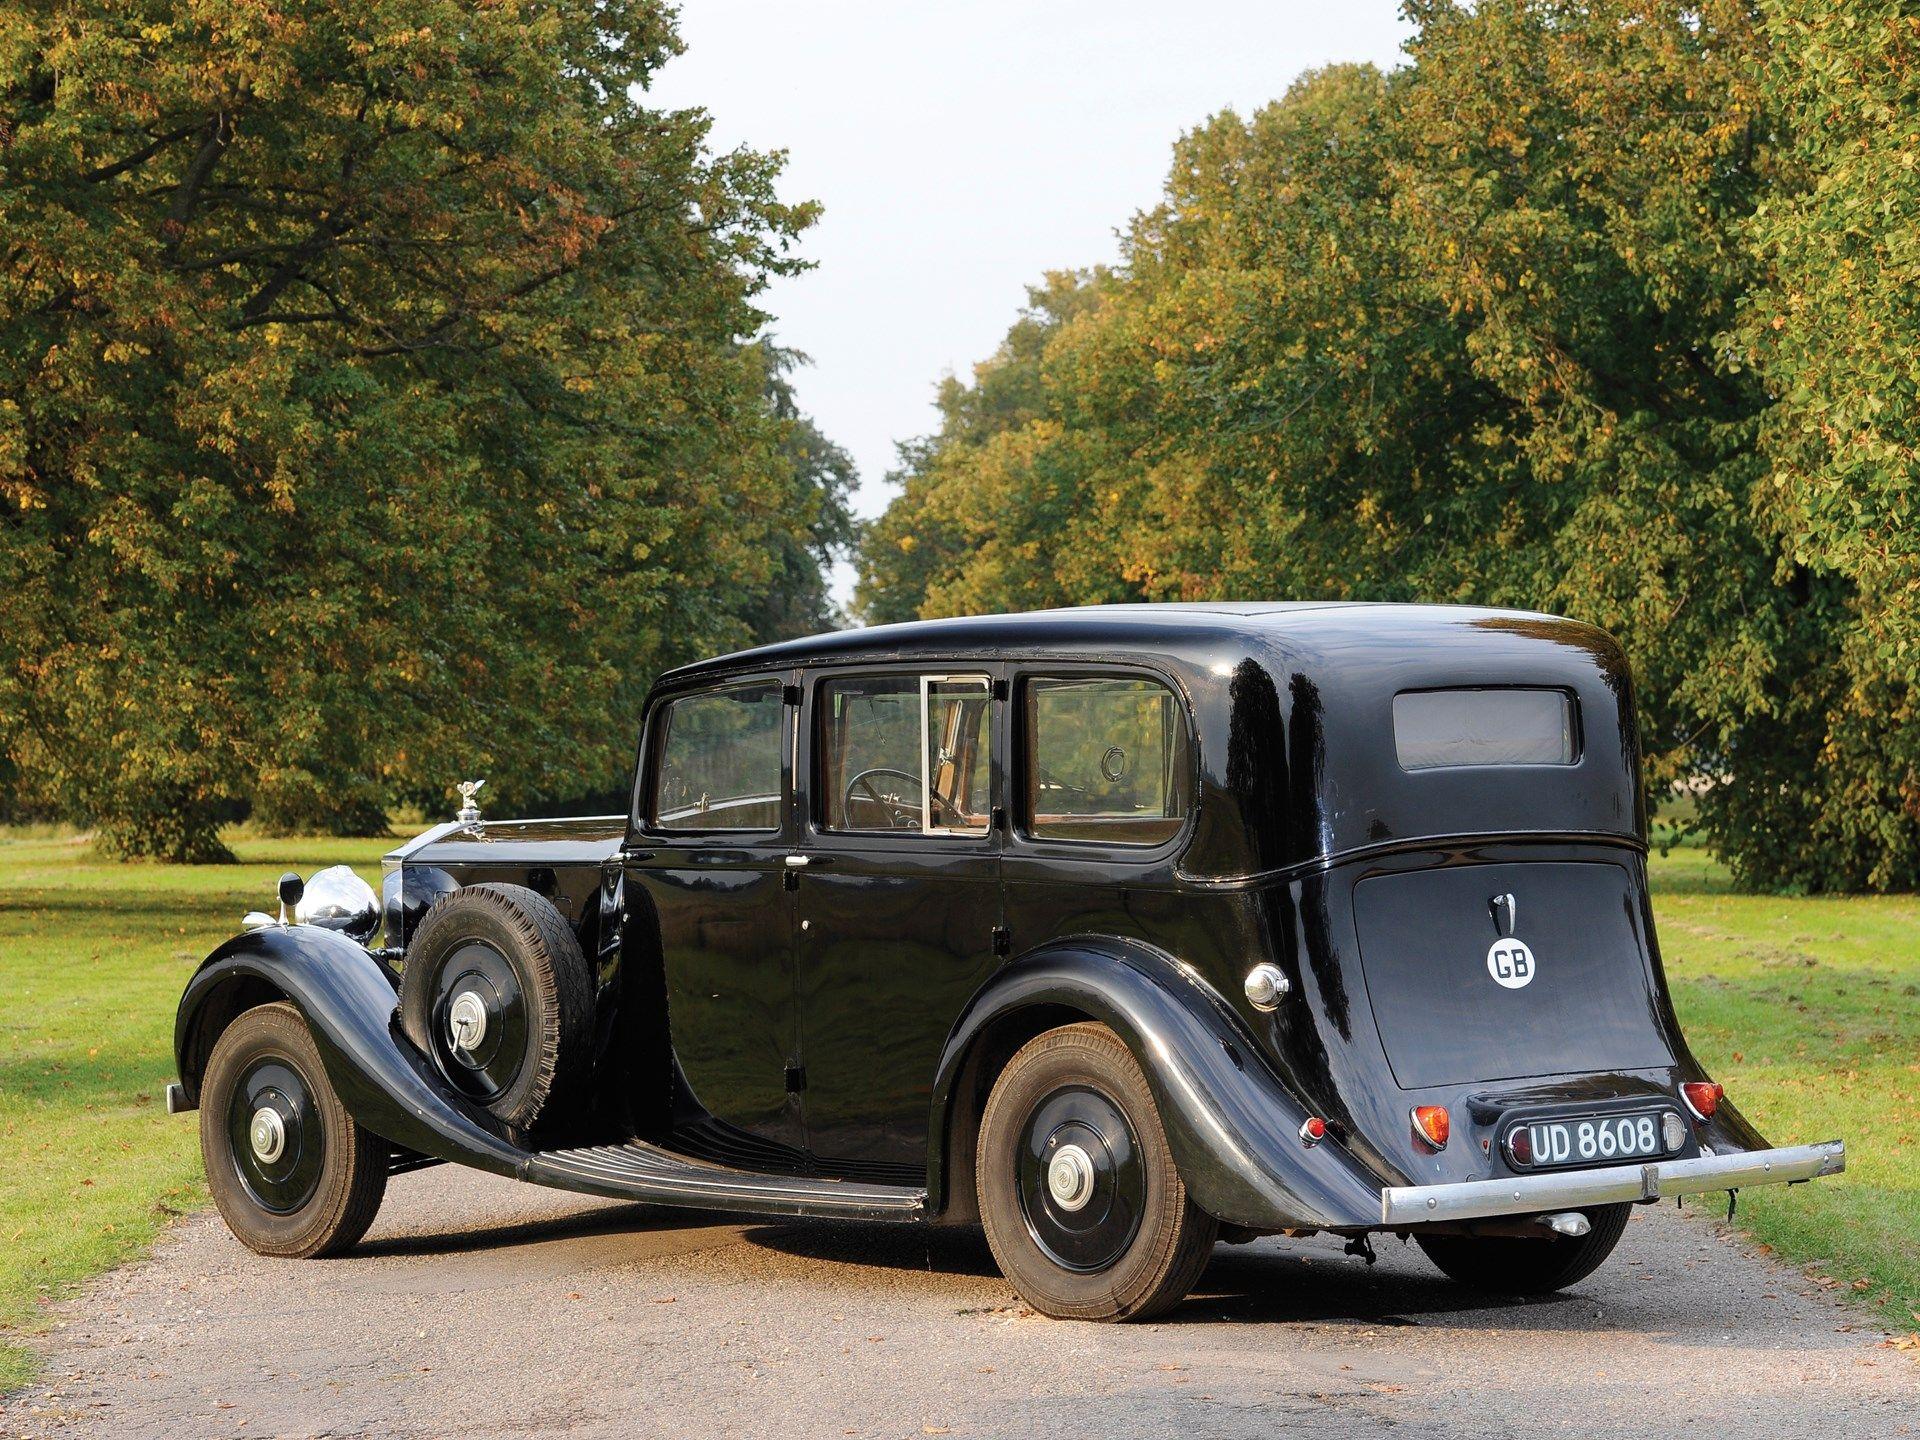 1937 Rolls Royce Phantom Iii Limousine Rolls Royce Classic Cars